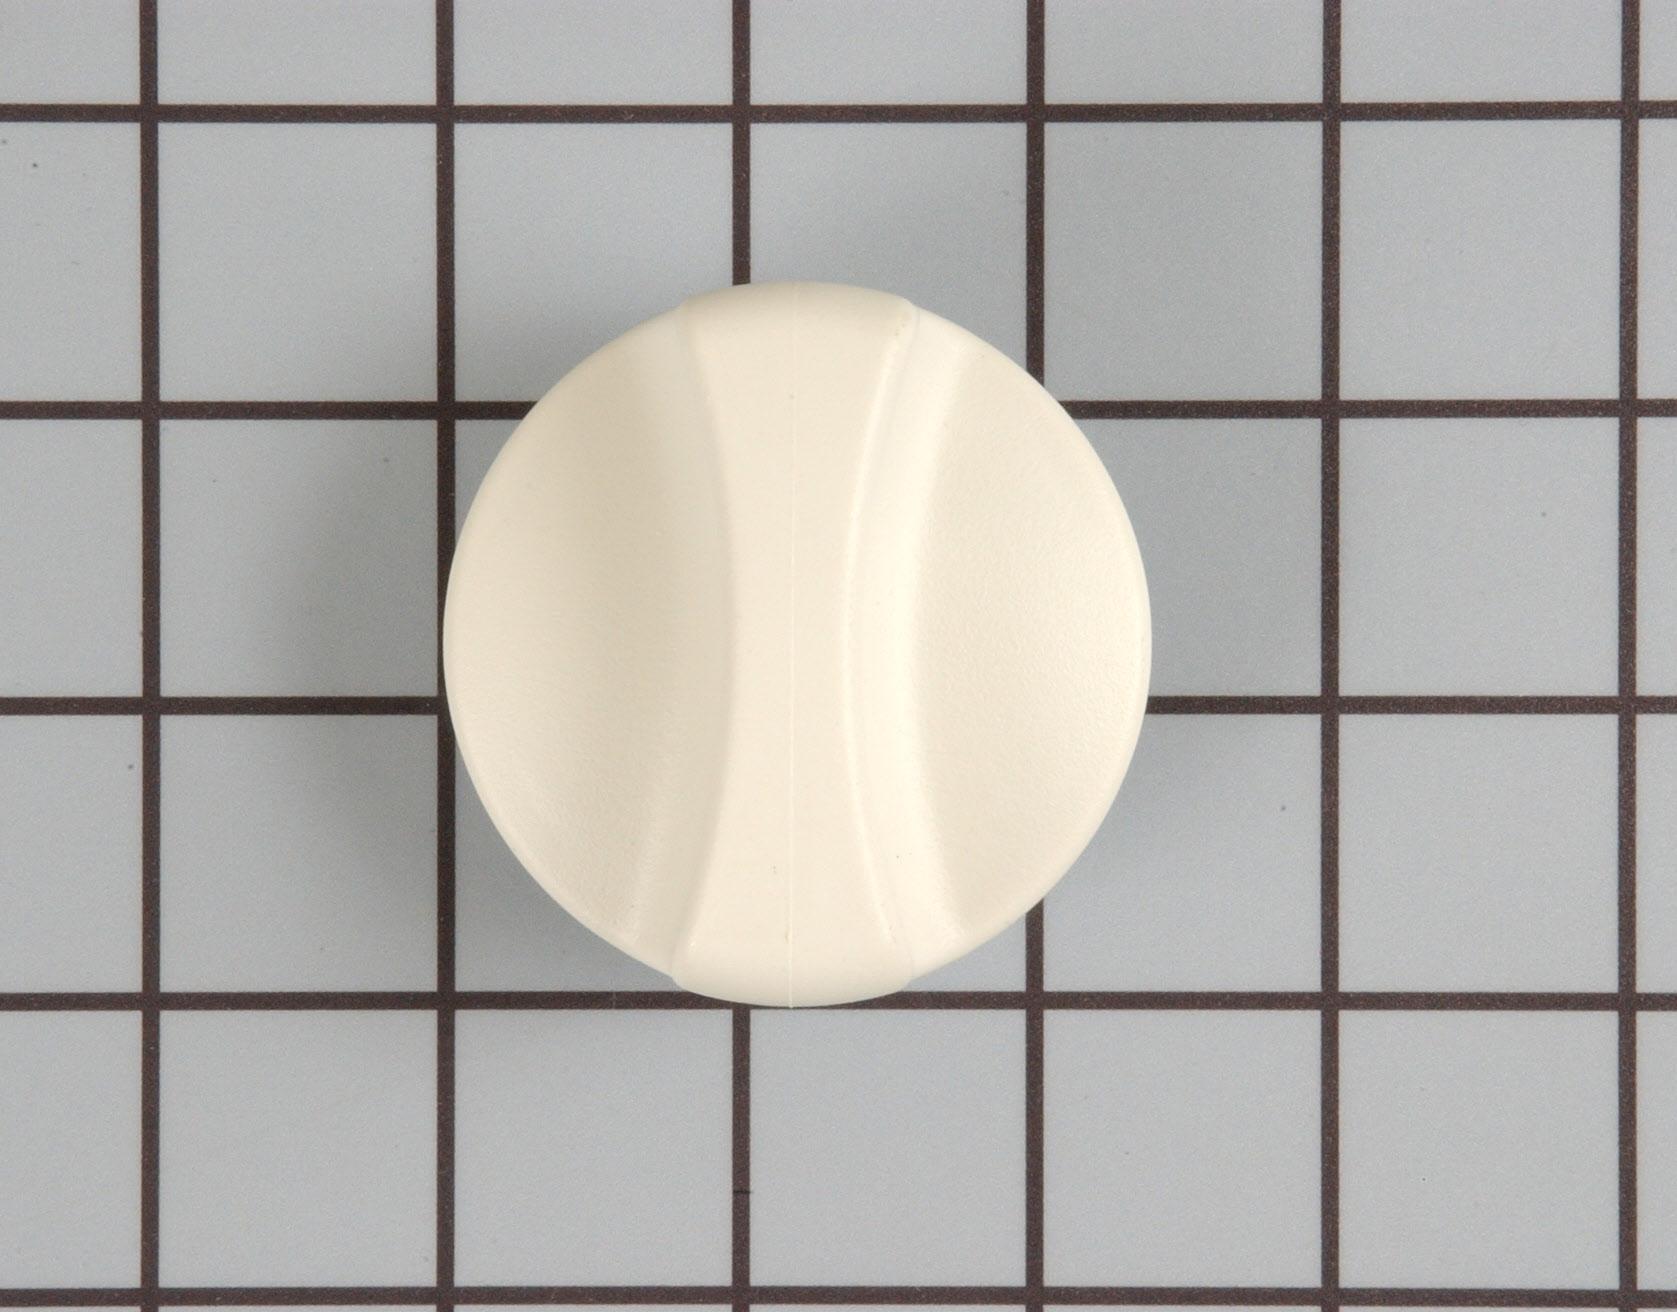 Kenmore Refrigerator Part # WP2186494T - Water Filter Cap